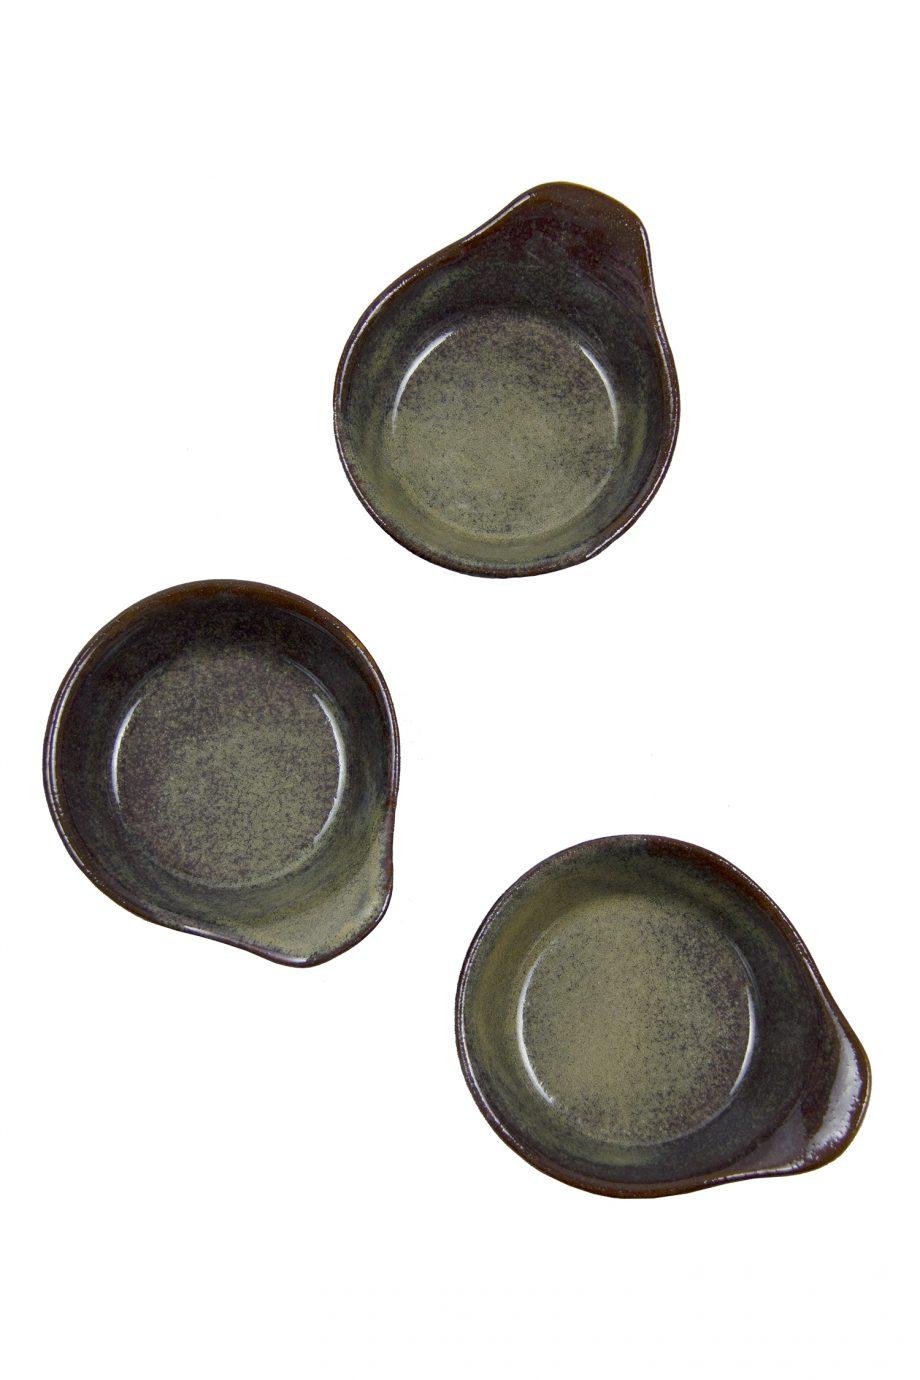 tapas schaal oker glaze ceramic small